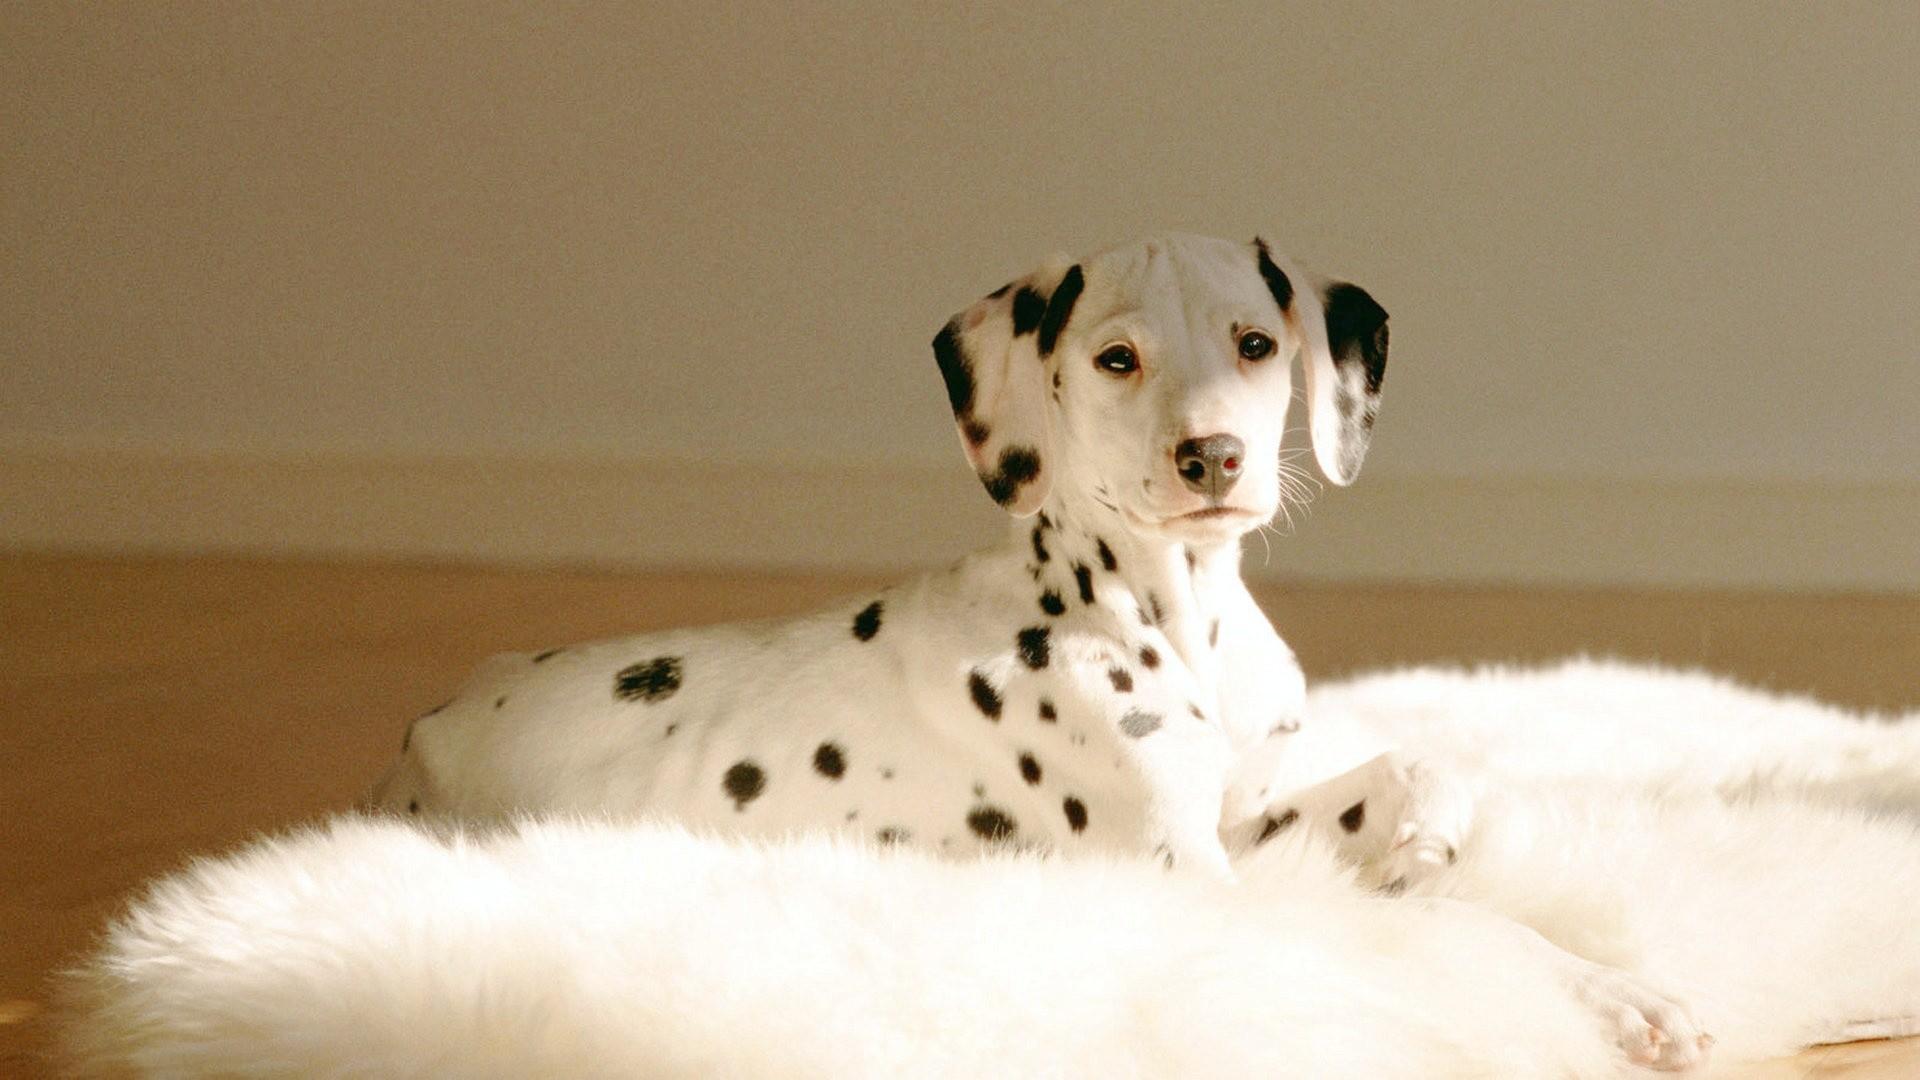 Cute Puppies Full Hd Wallpapers Dalmatian Wallpaper 55 Images